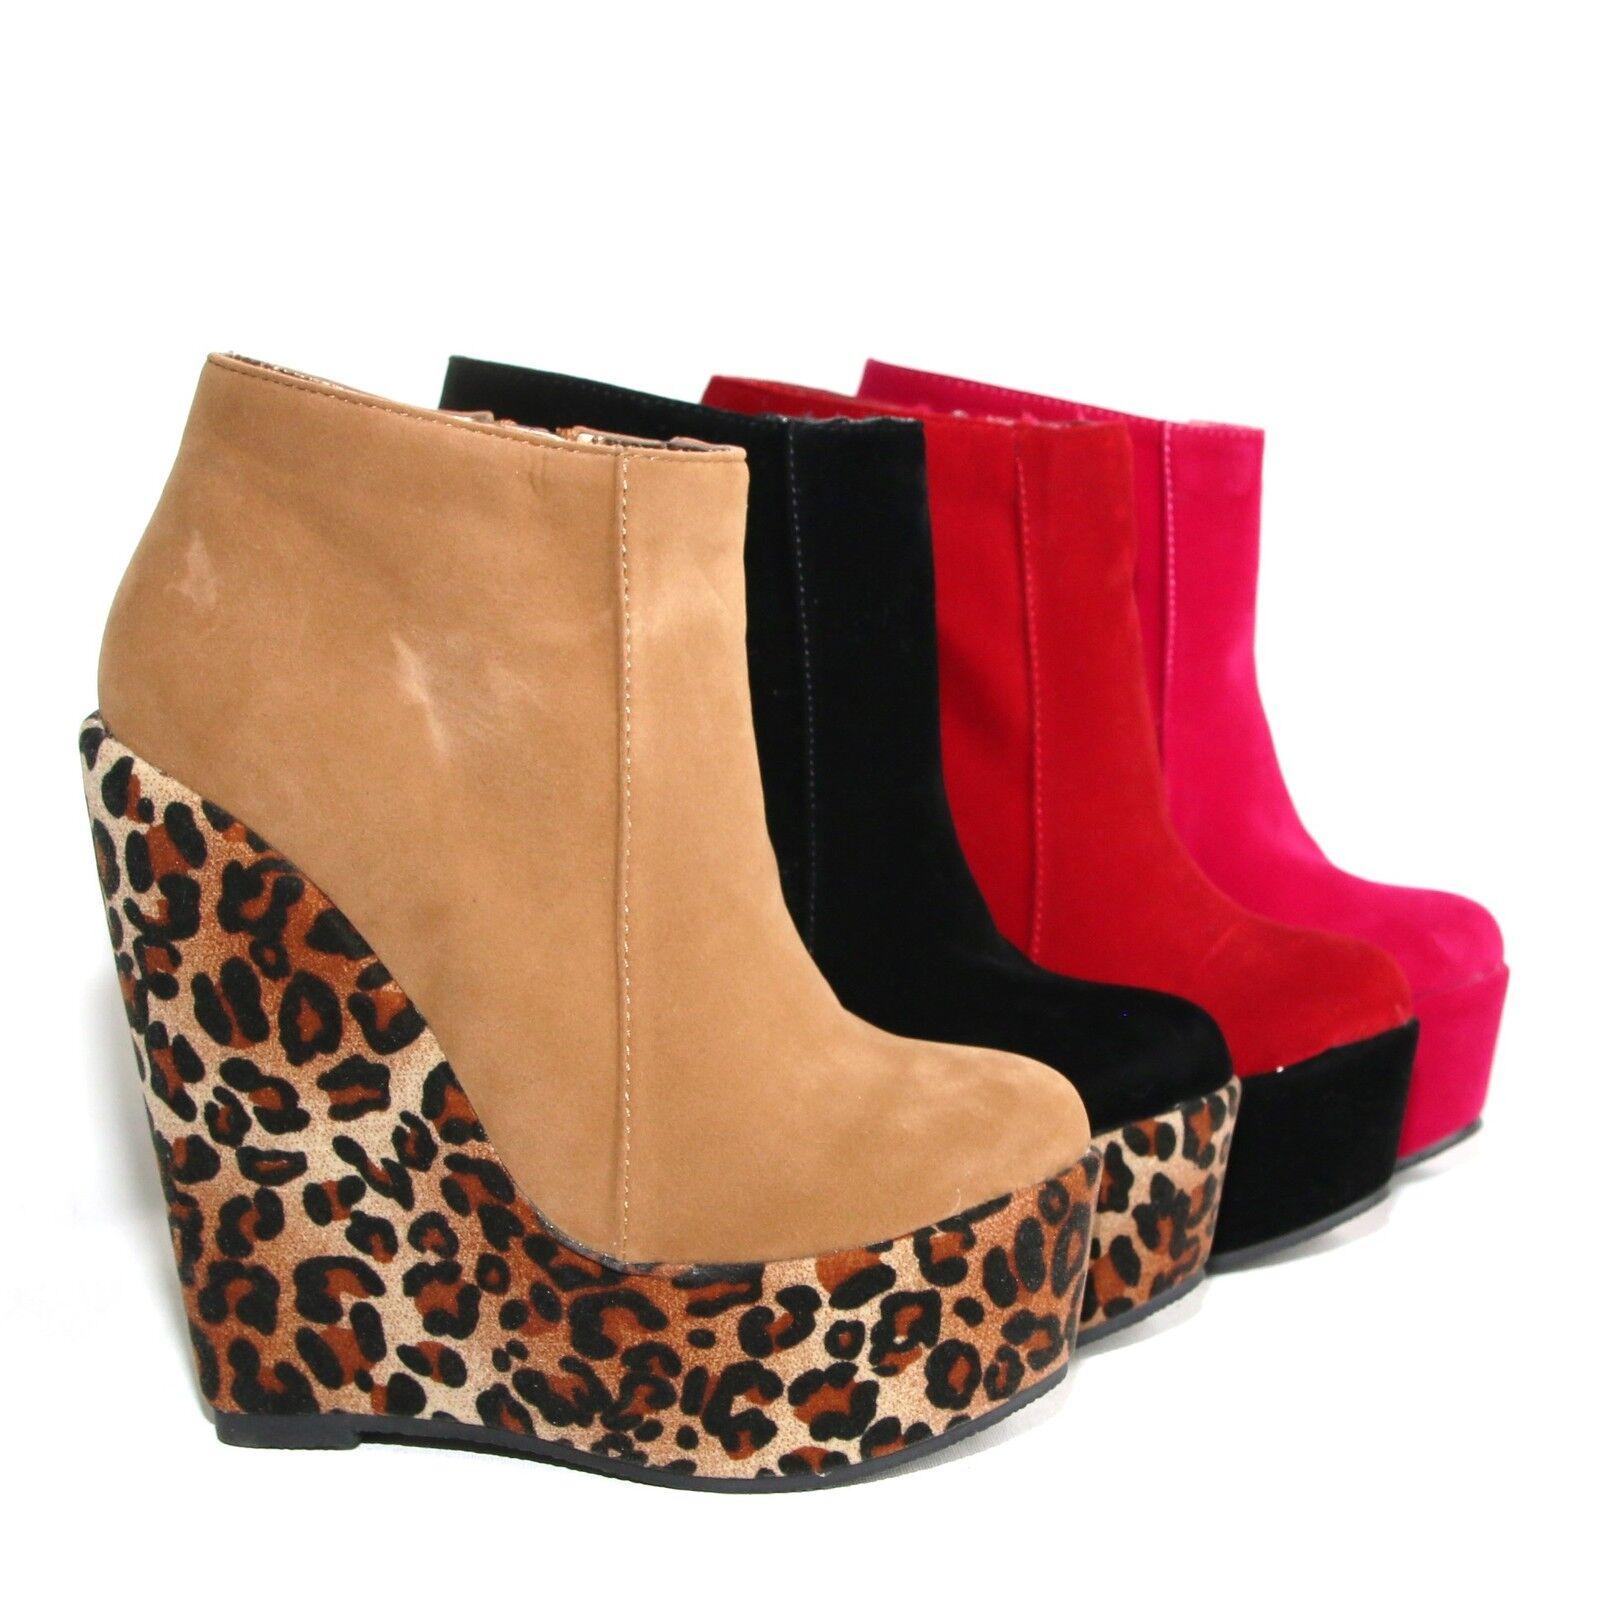 Damen Plateau Stiefeletten Wedges Keilabsatz Pumps High Heels 123